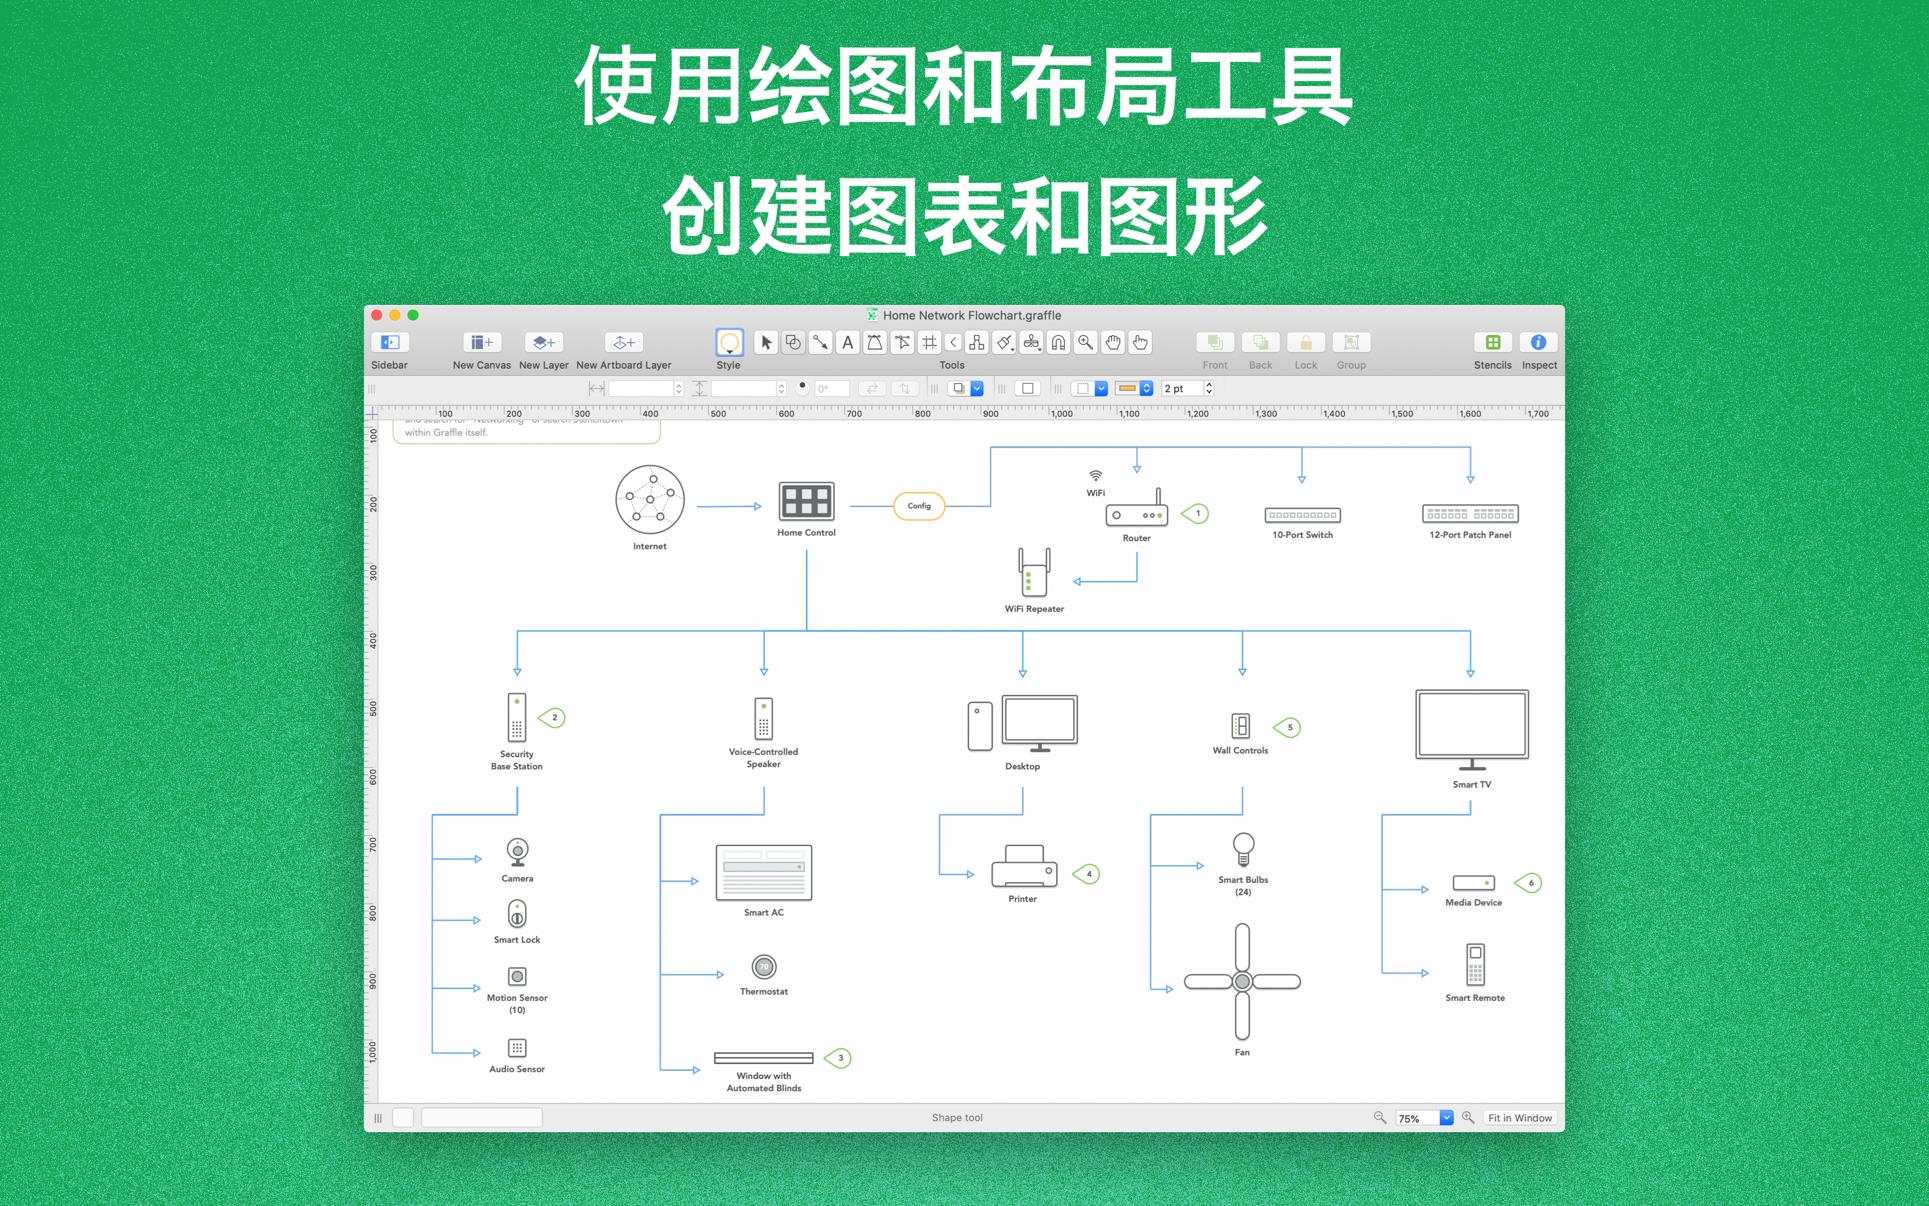 OmniGraffle Pro Mac 破解版 苹果上最著名的绘图软件-麦氪搜(iMacso.com)